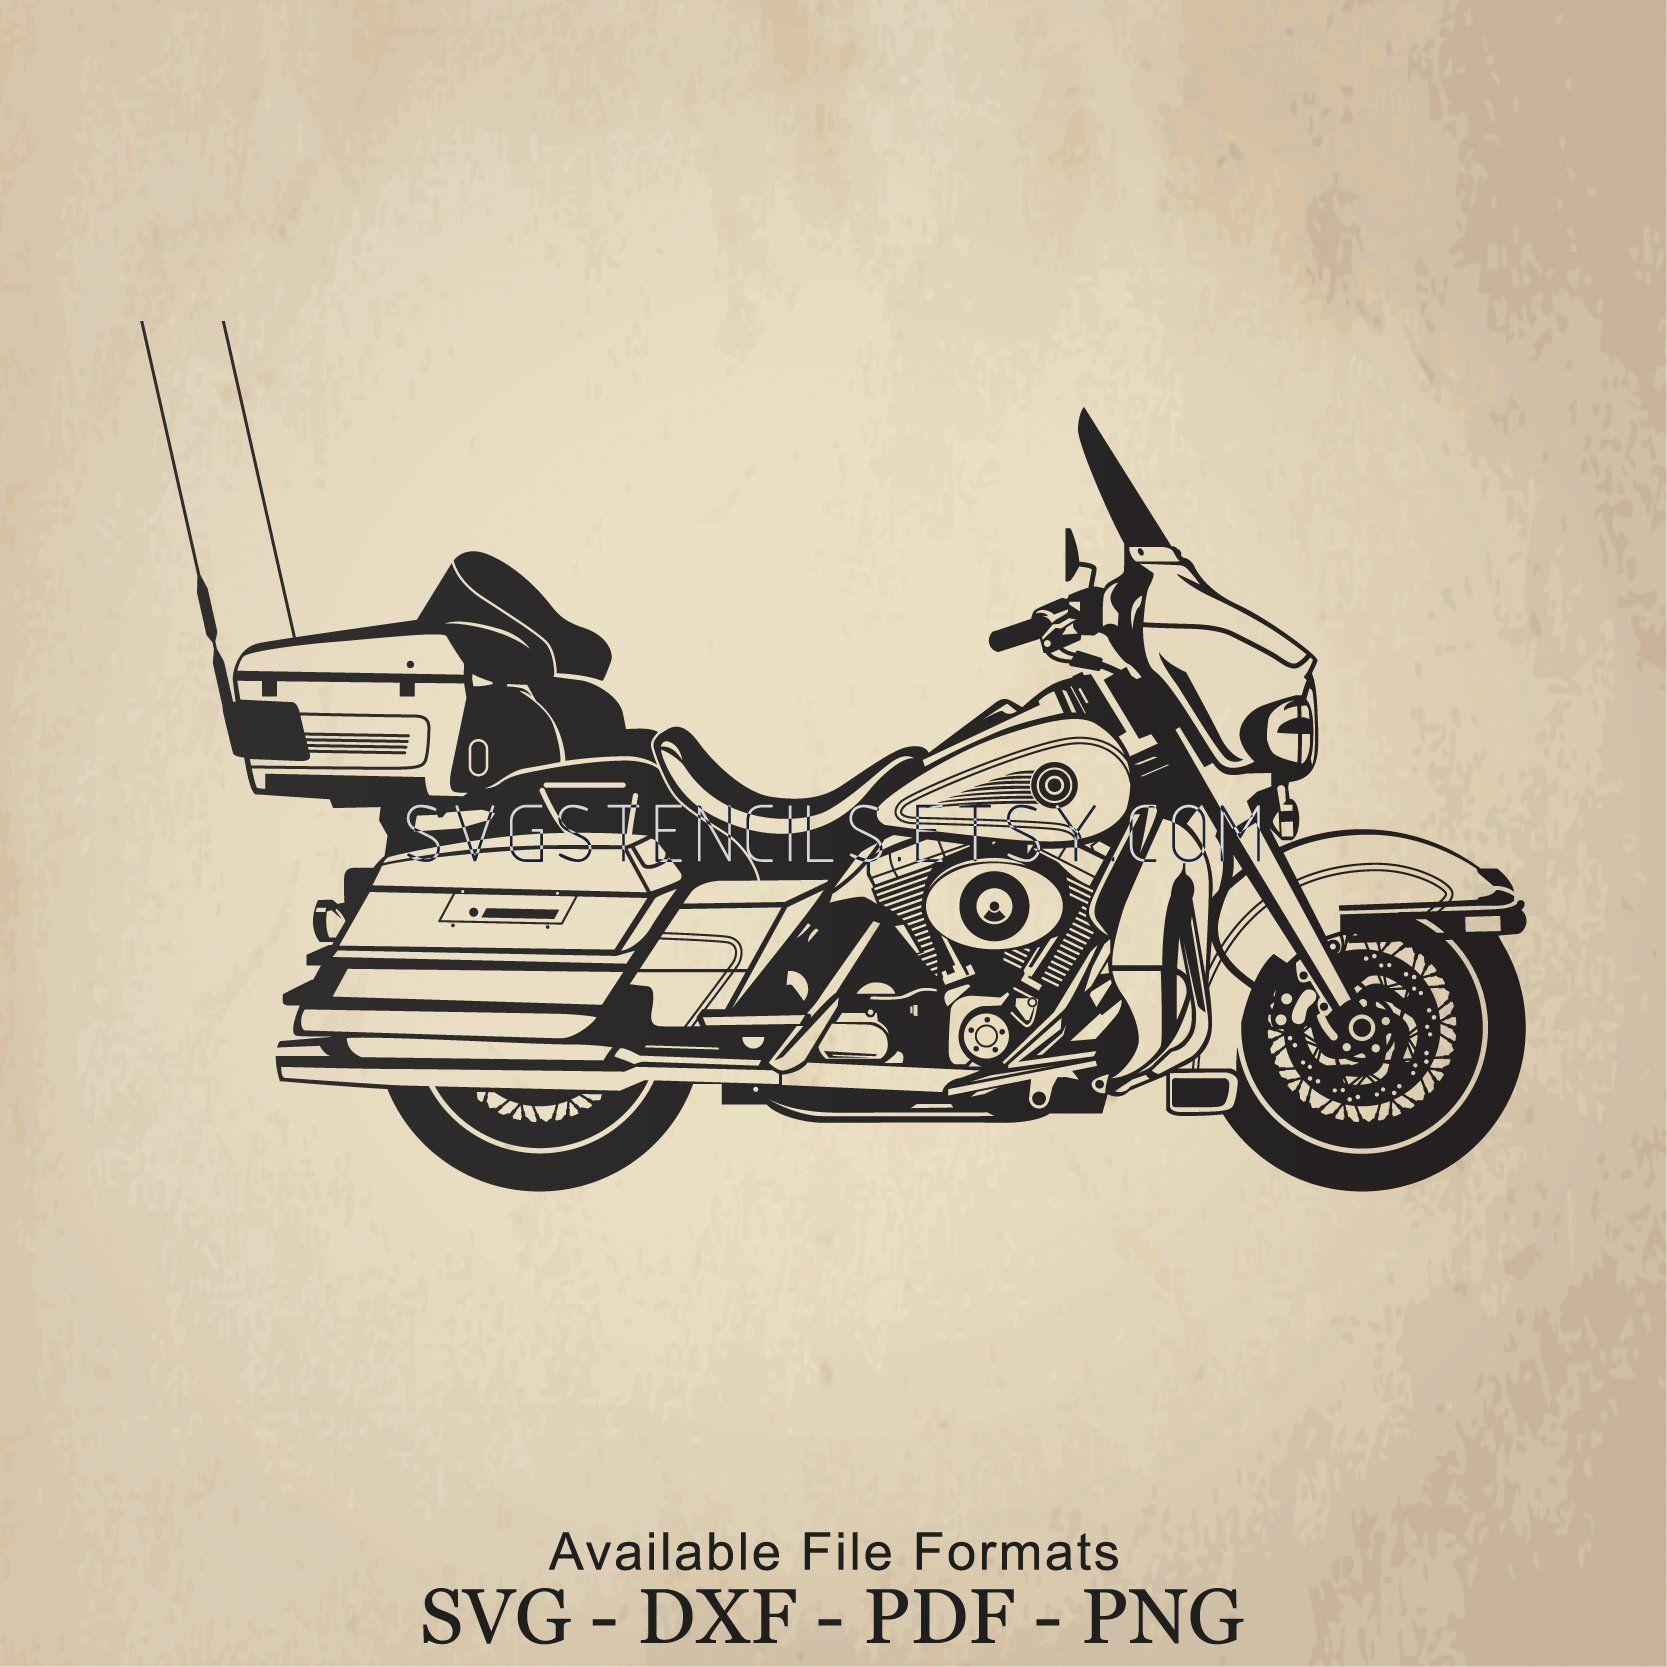 Svg Harley Motorcycle Electra Glide Stencil Silhouette Etsy Motorcycle Harley Harley Royal Enfield